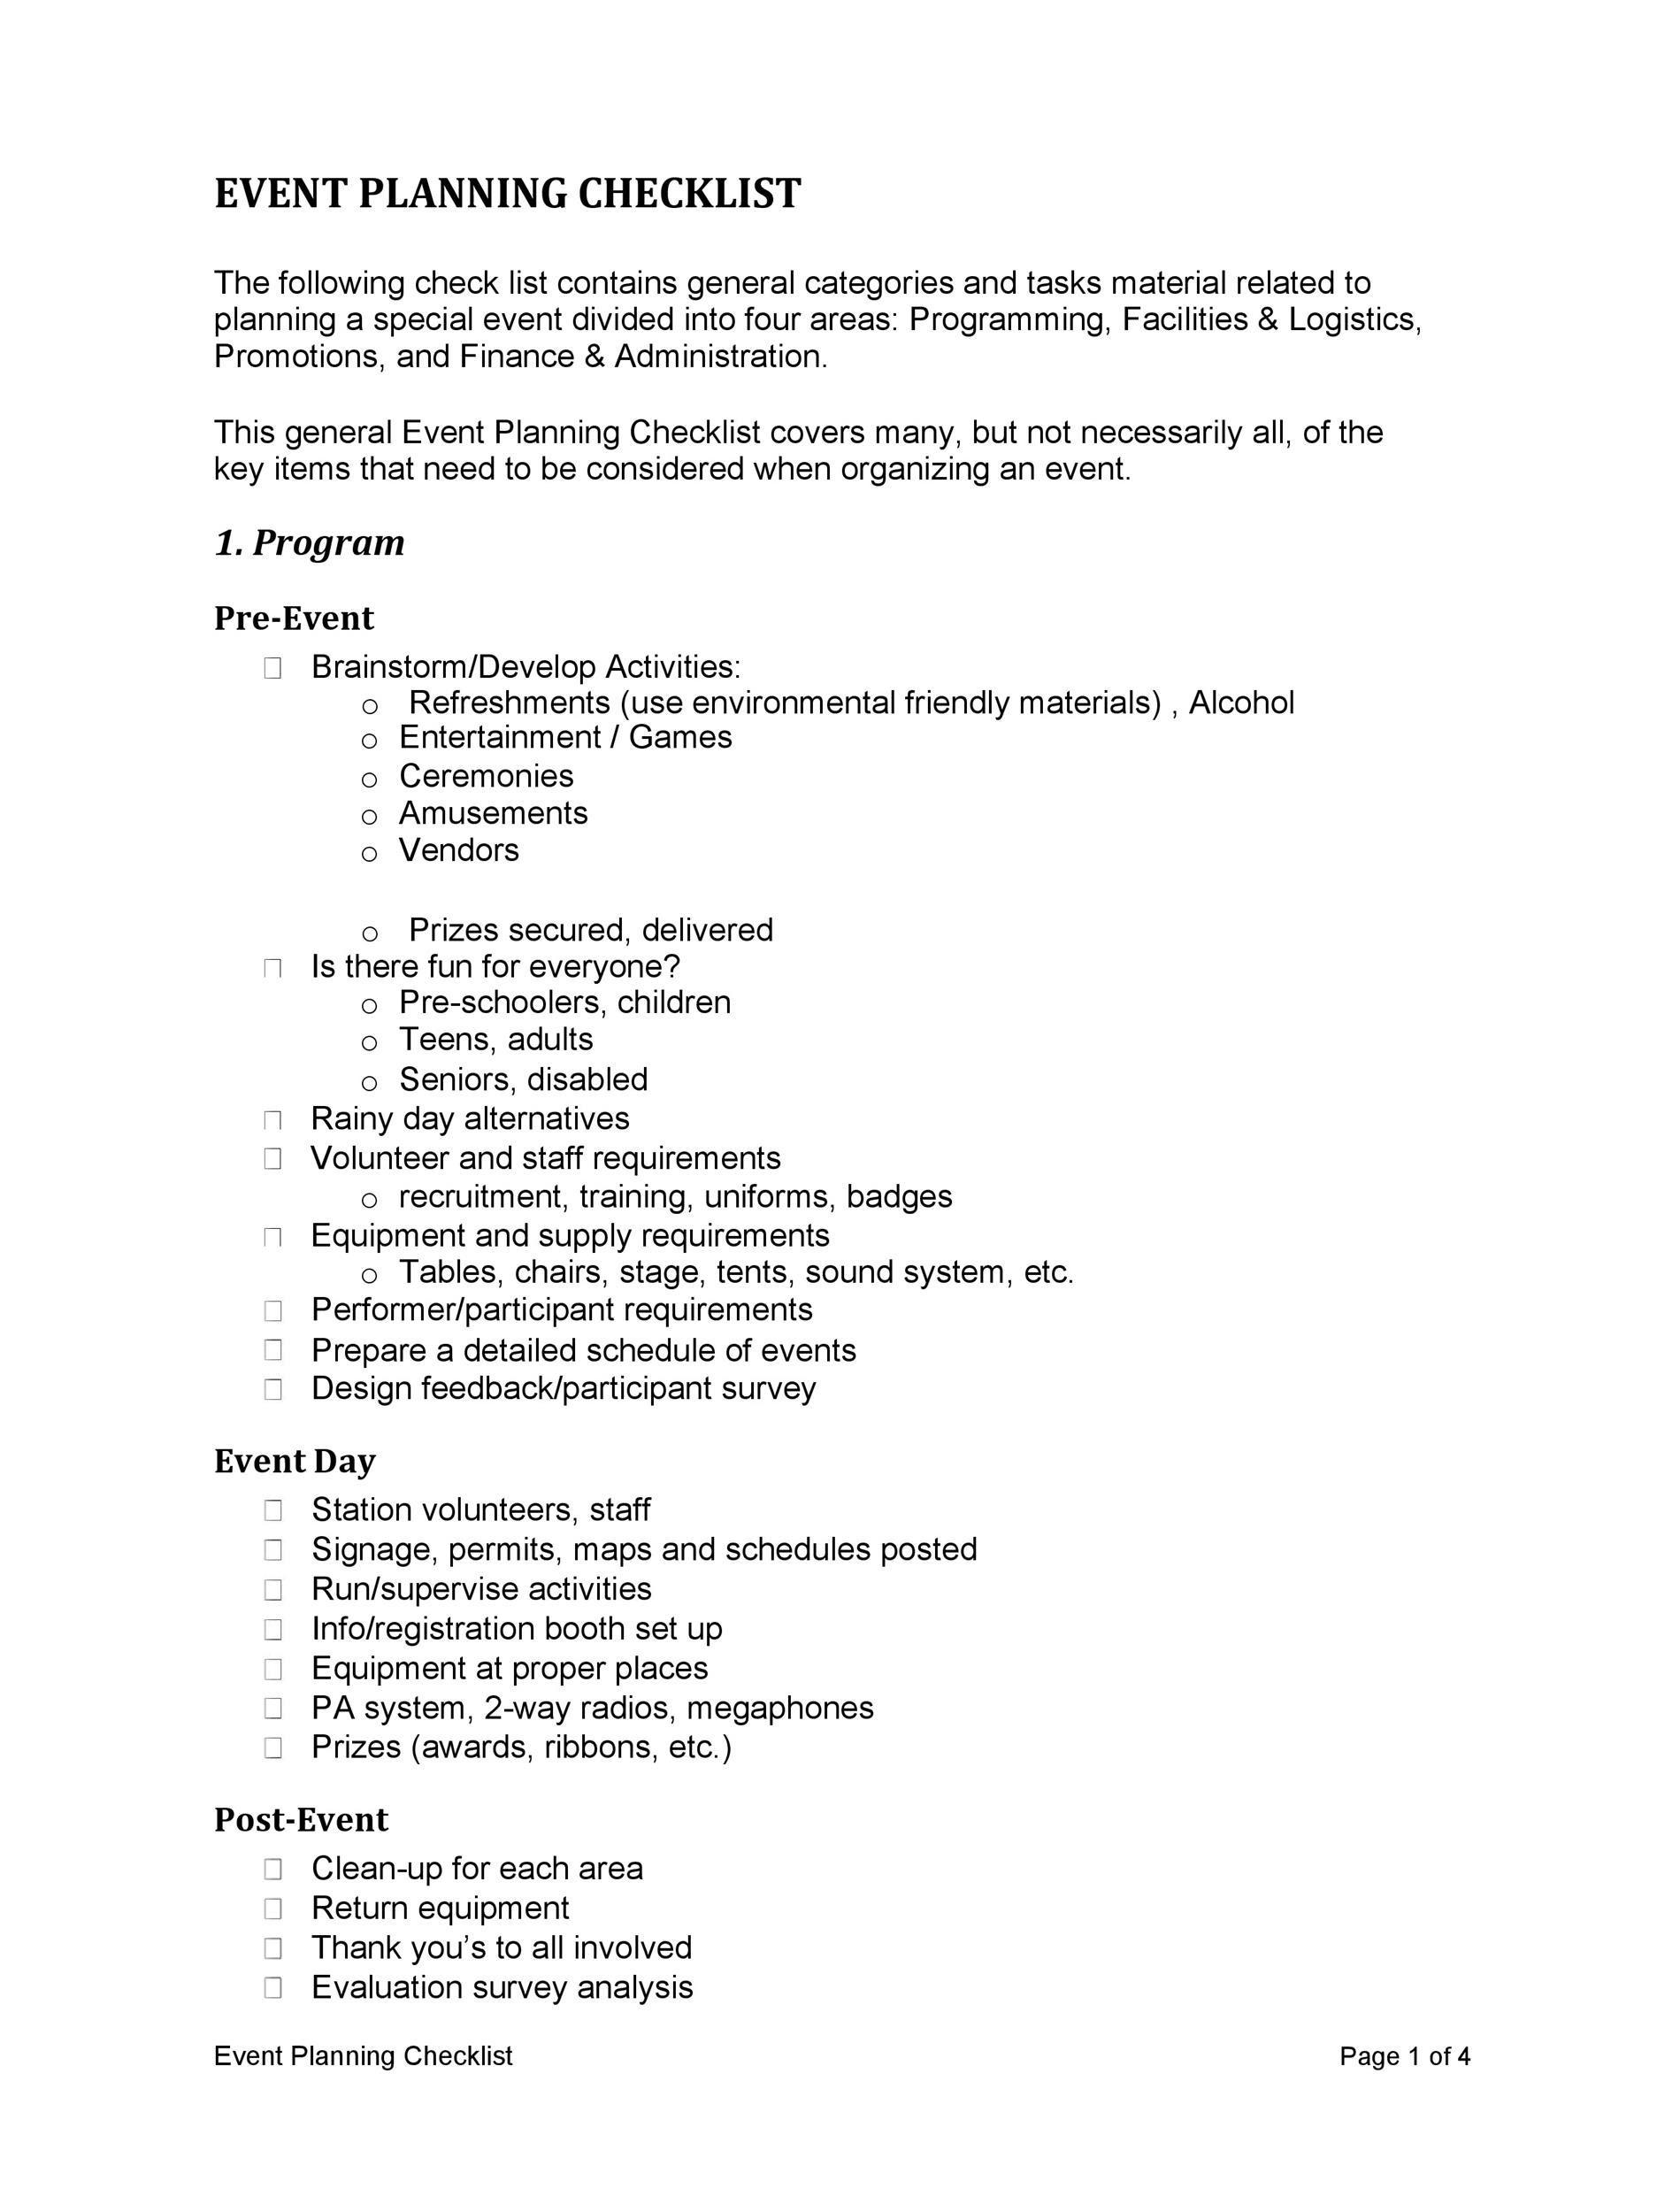 002 Astounding Free Event Planner Checklist Template Inspiration  Planning PartyFull